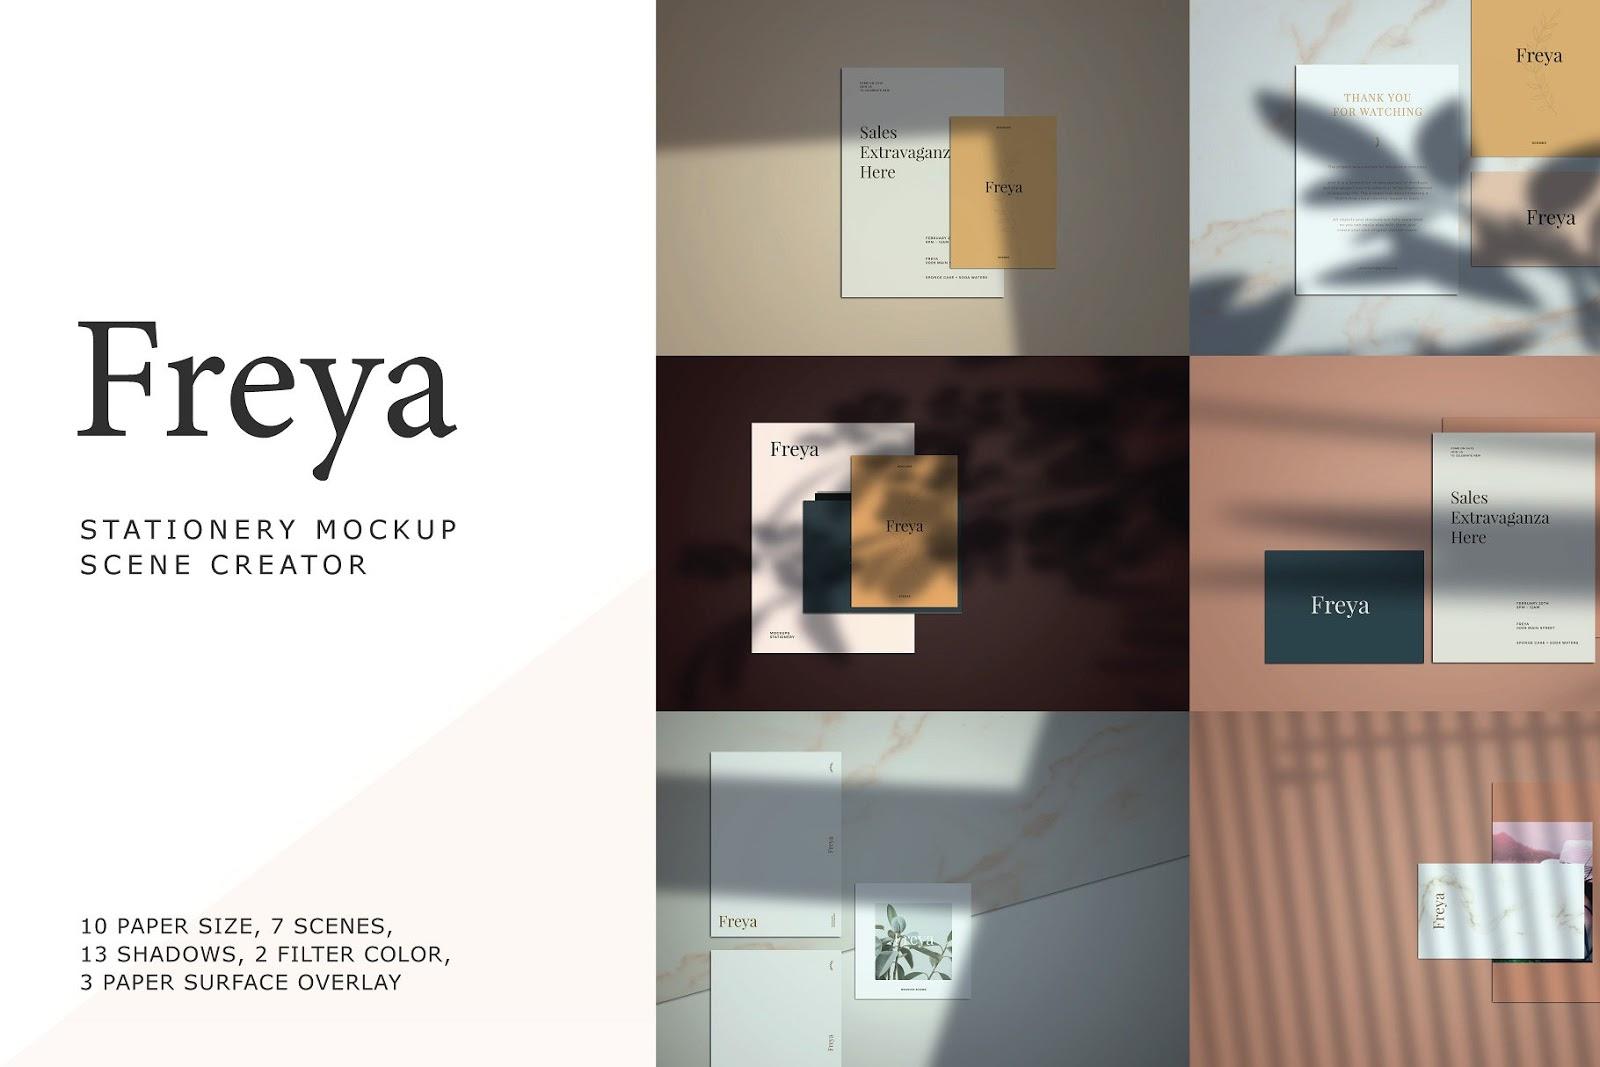 Freya Stationery Scene Creator